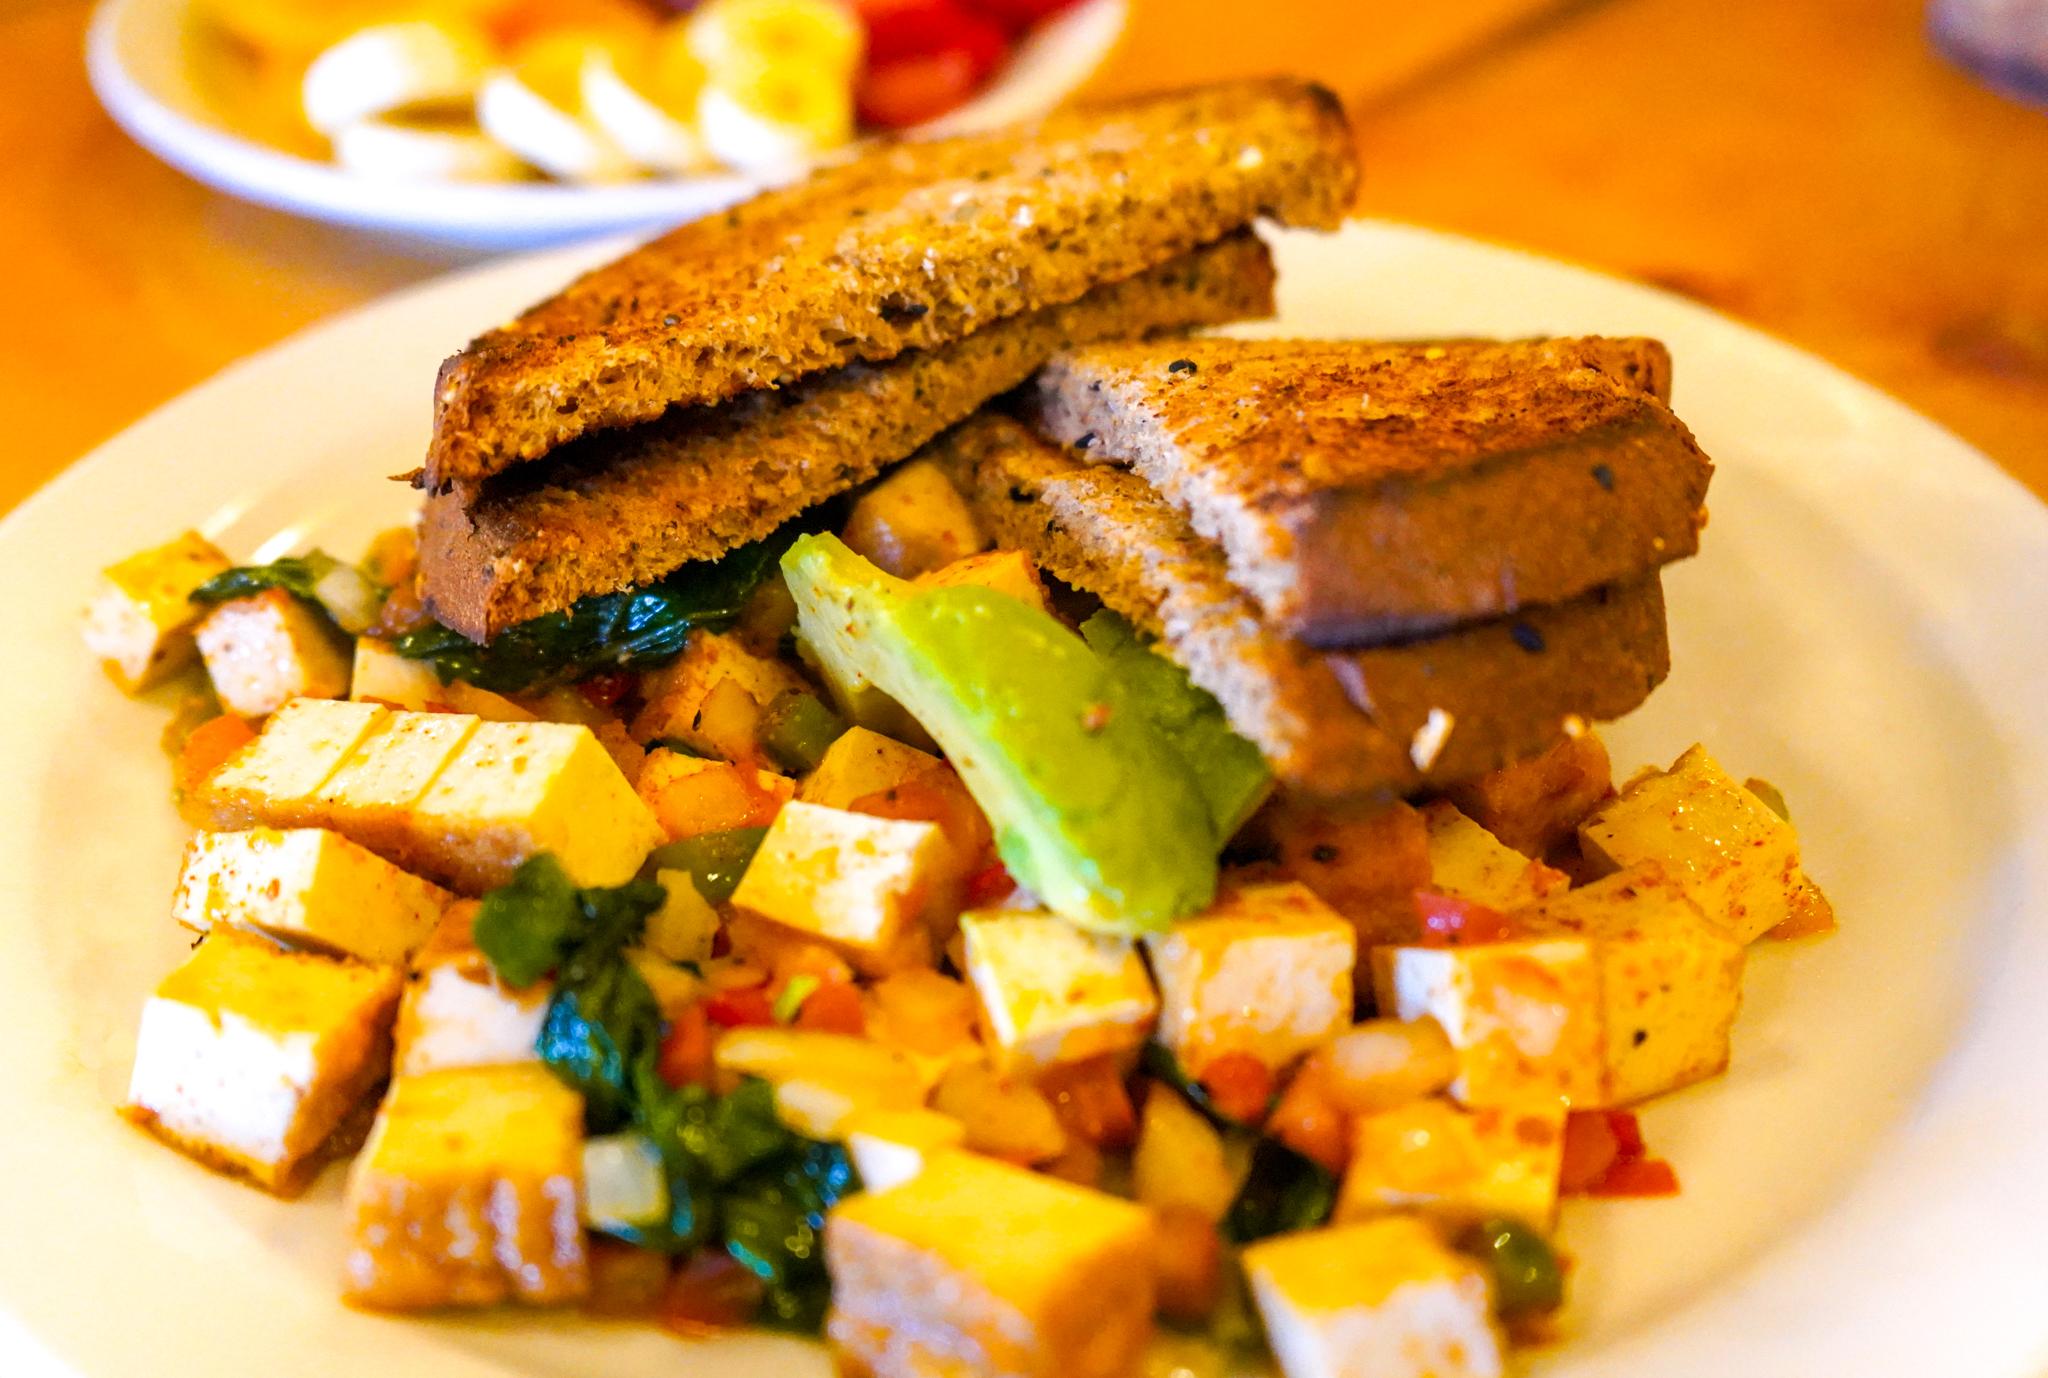 Uprooted-Traveler-rocky-mountain-national-park-tofu-scramble-notchtop-cafe-estes-park-vegan.jpg